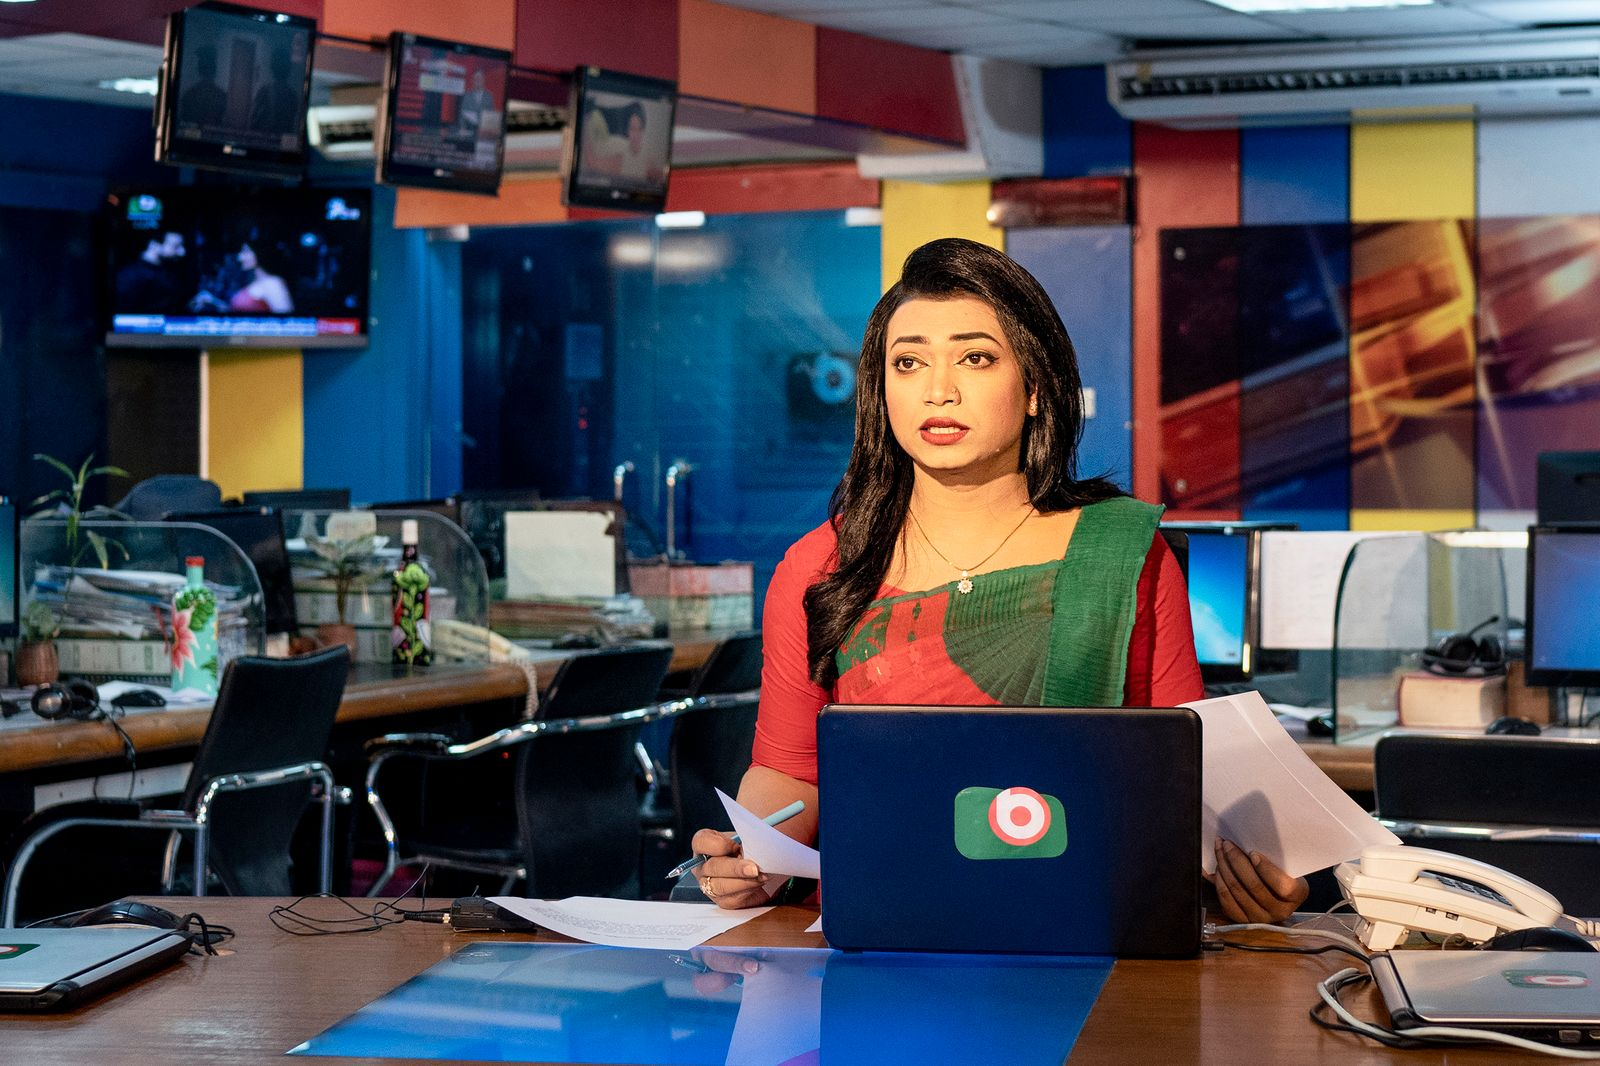 Tashnuva Anan Shishir presents the news at the Boishakhi TV studio in Dhaka, Bangladesh, on Saturday, March 13, 2021. (Fabeha Monir/The New York Times)